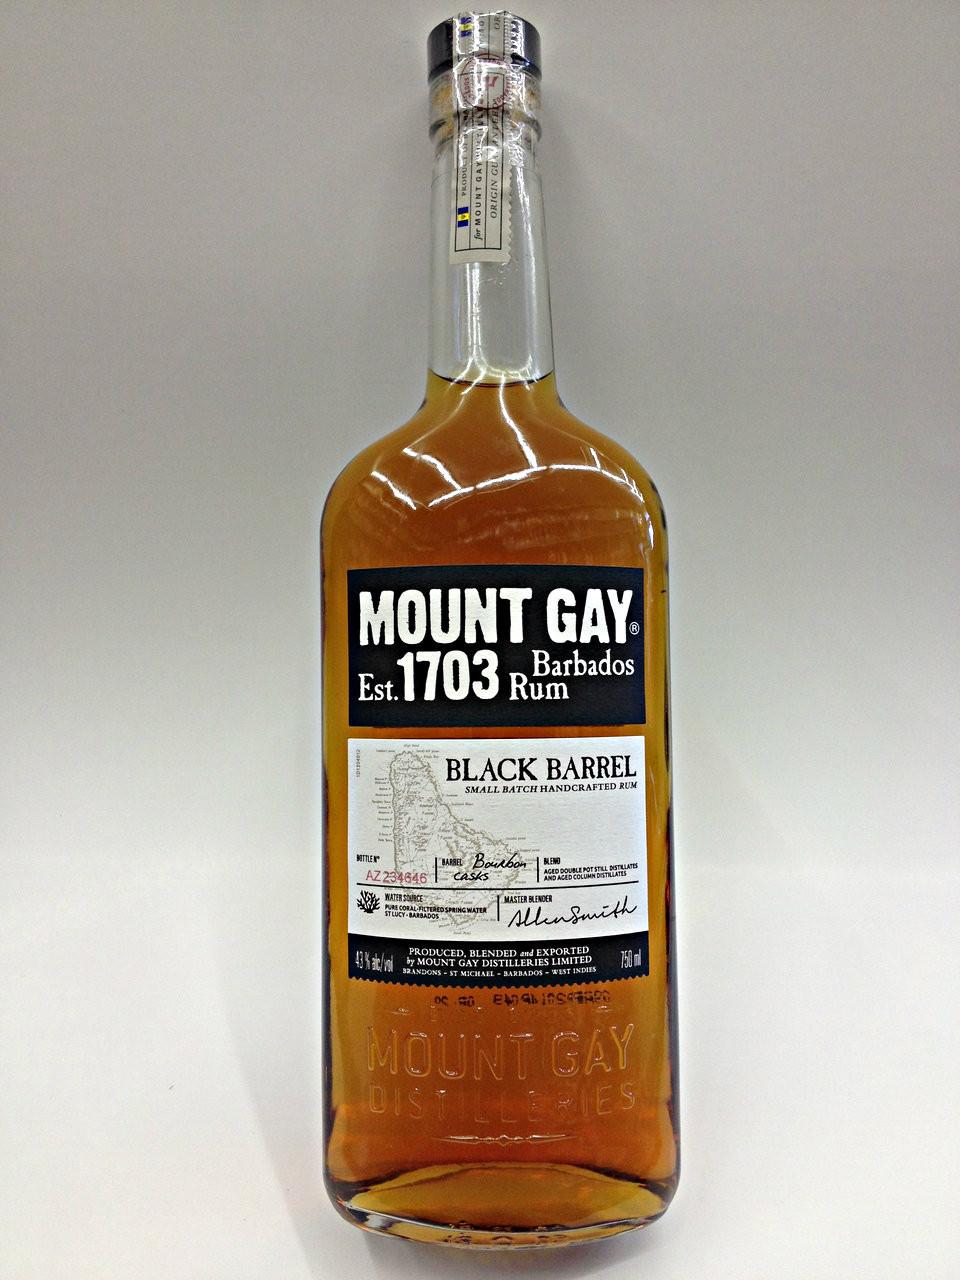 from Ezekiel mount gay barbados